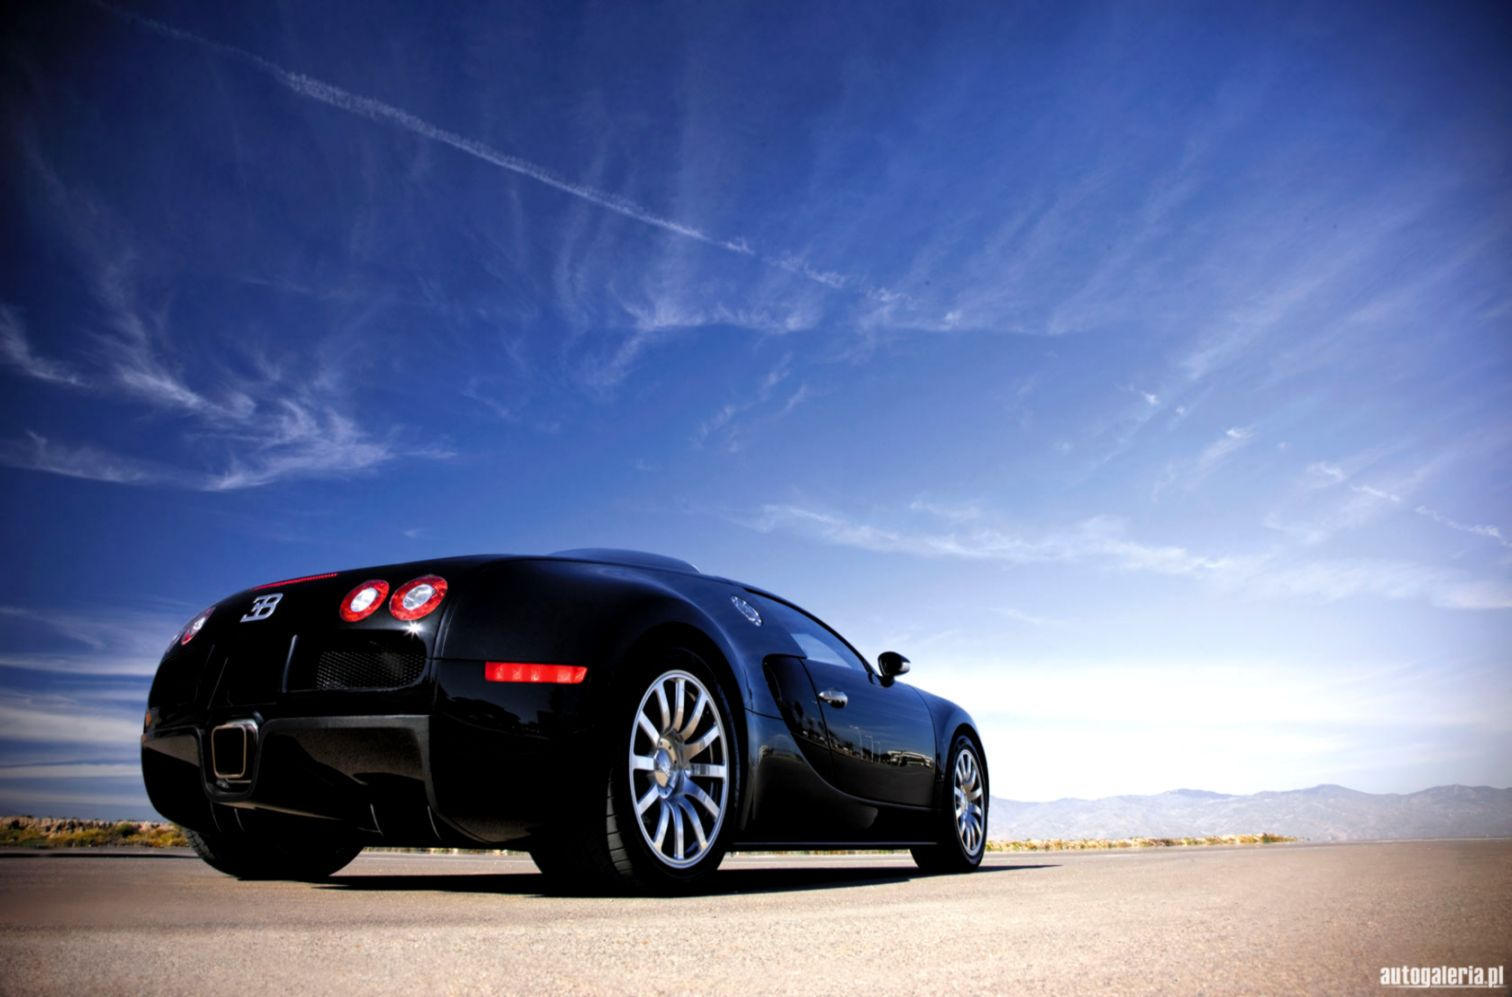 50 Super Sports Car Wallpapers That39ll Blow Your Desktop Away